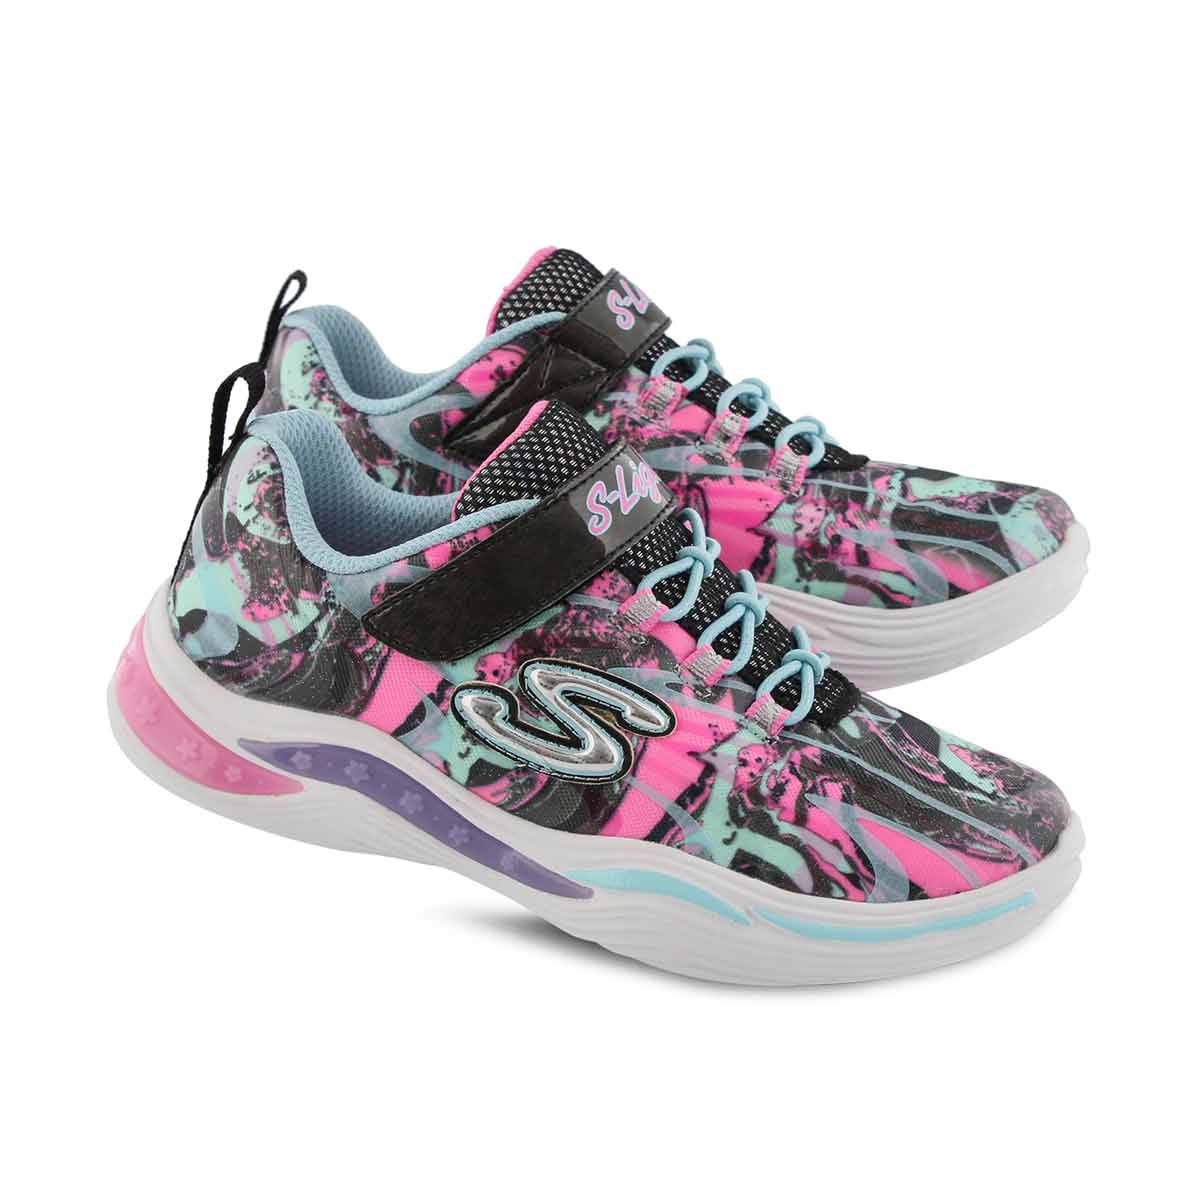 Grls Power Petals blk multi sneaker